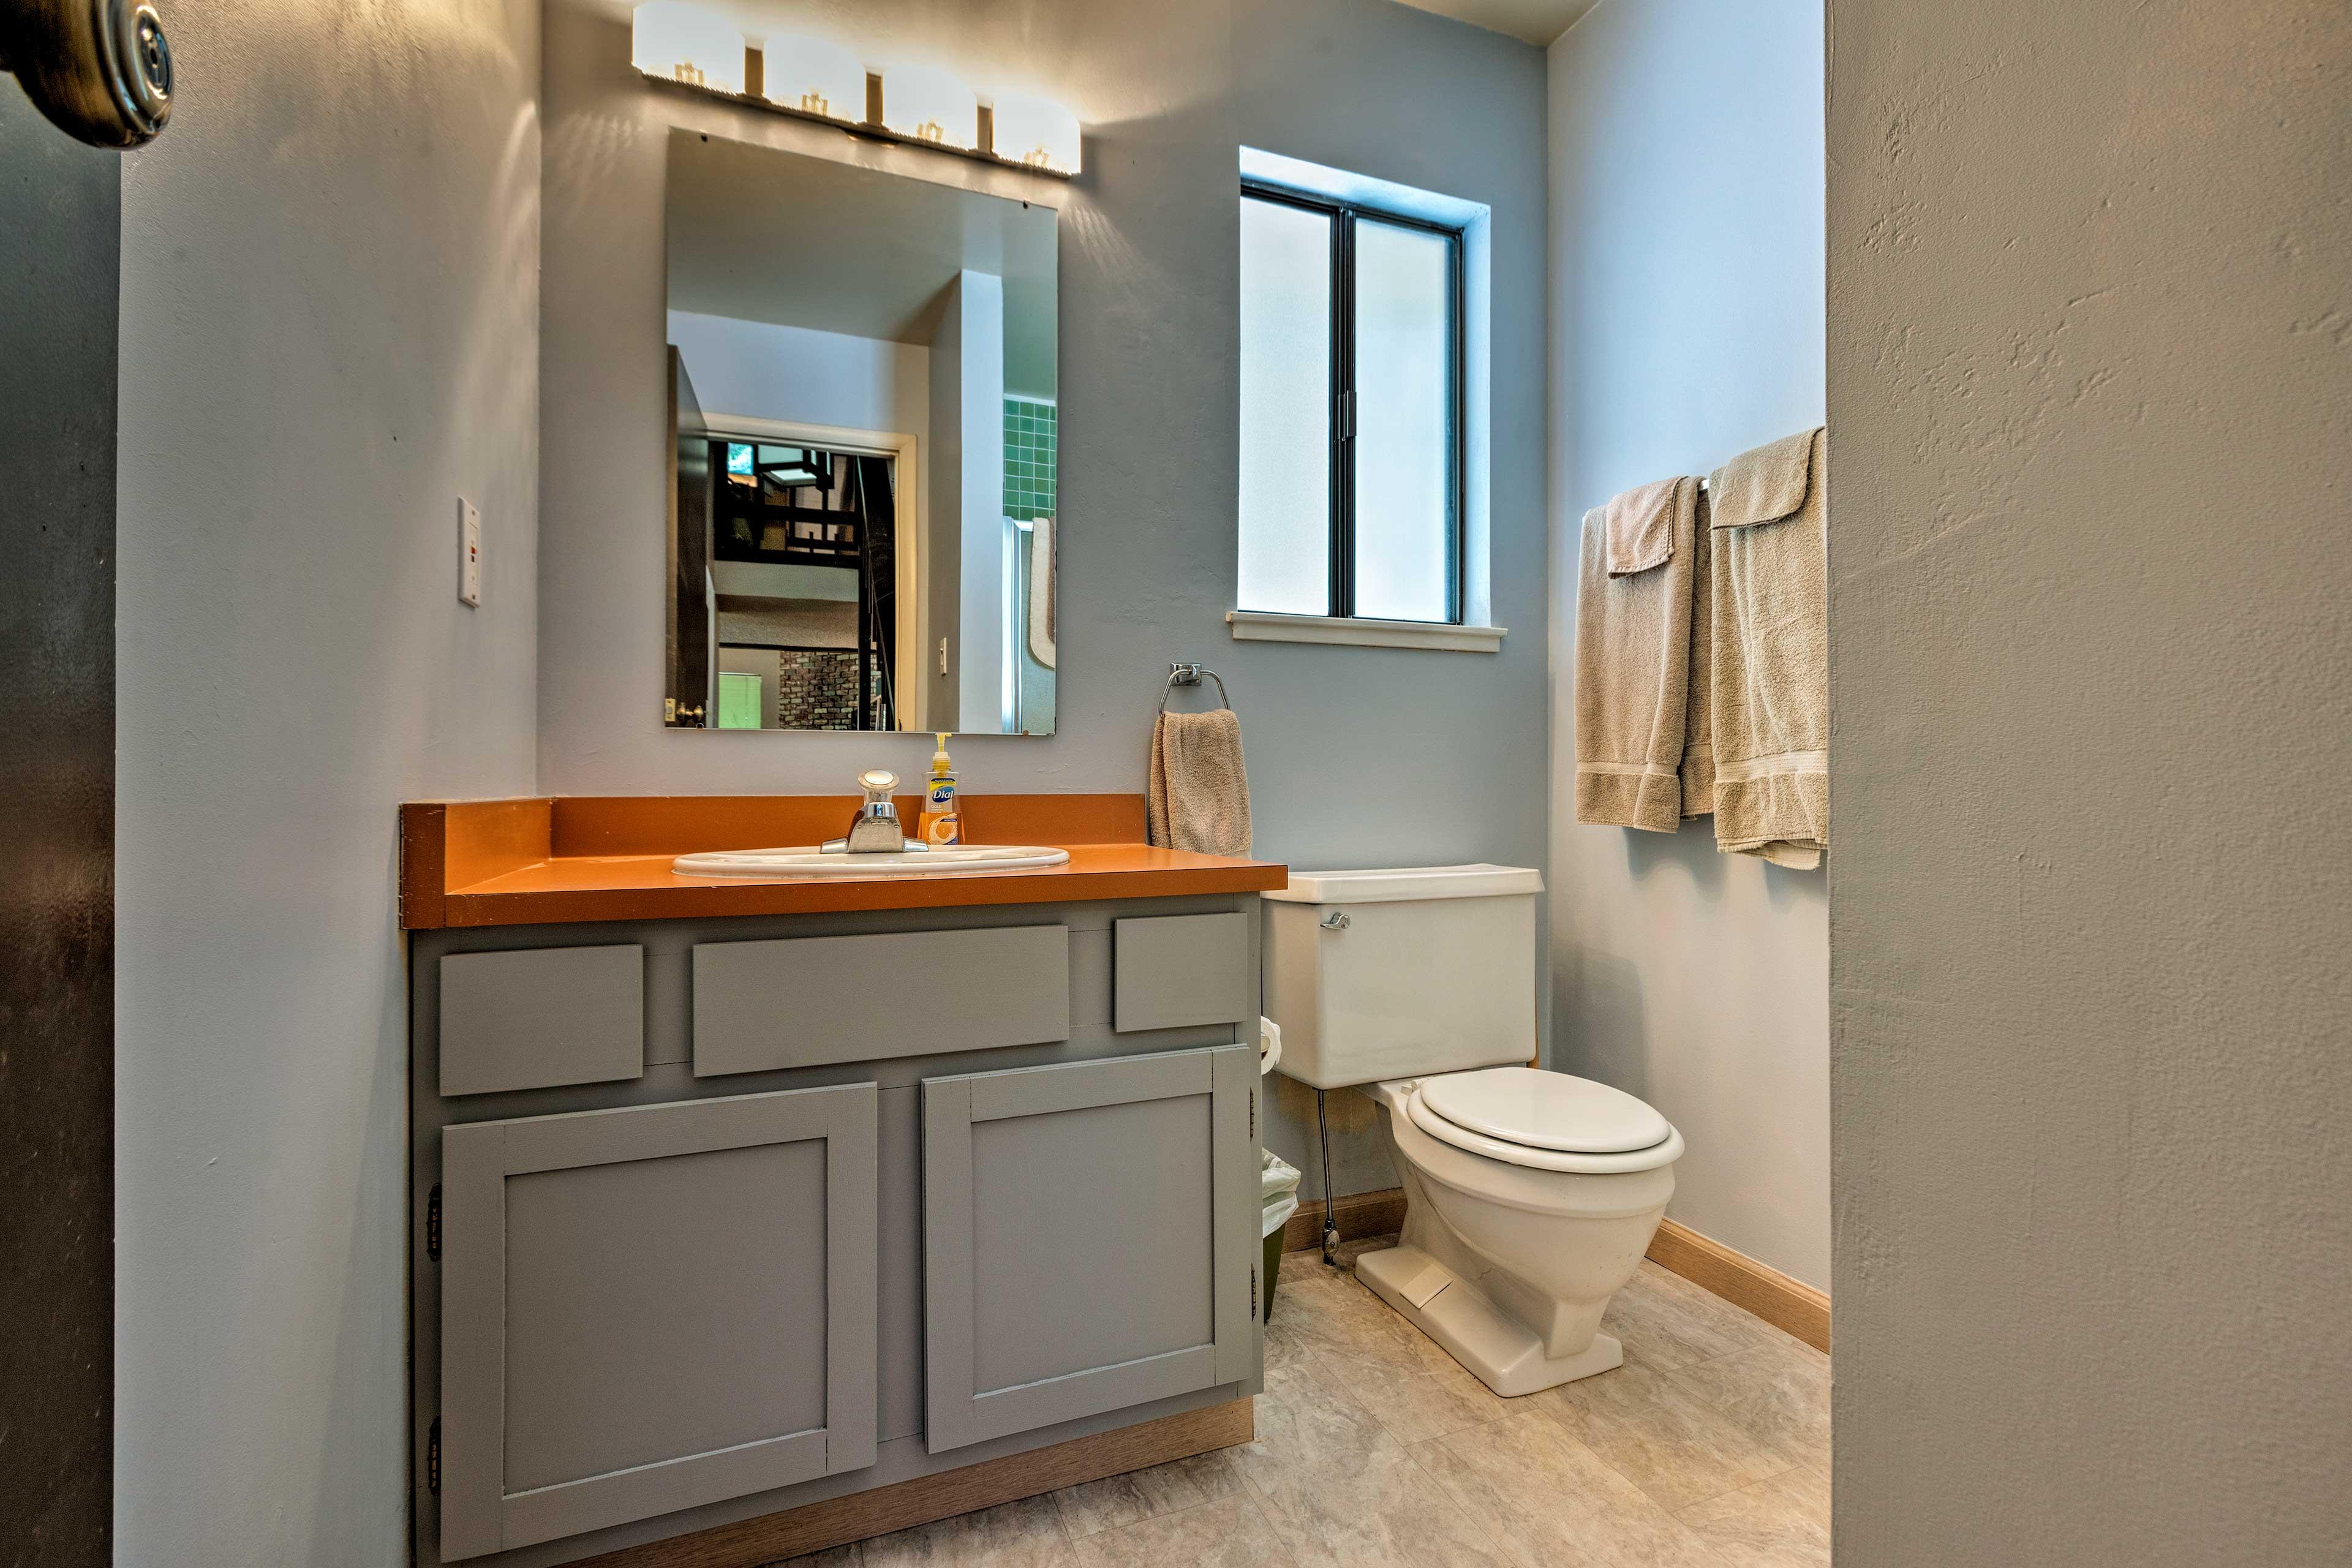 Rinse up in the half bathroom before dinner.